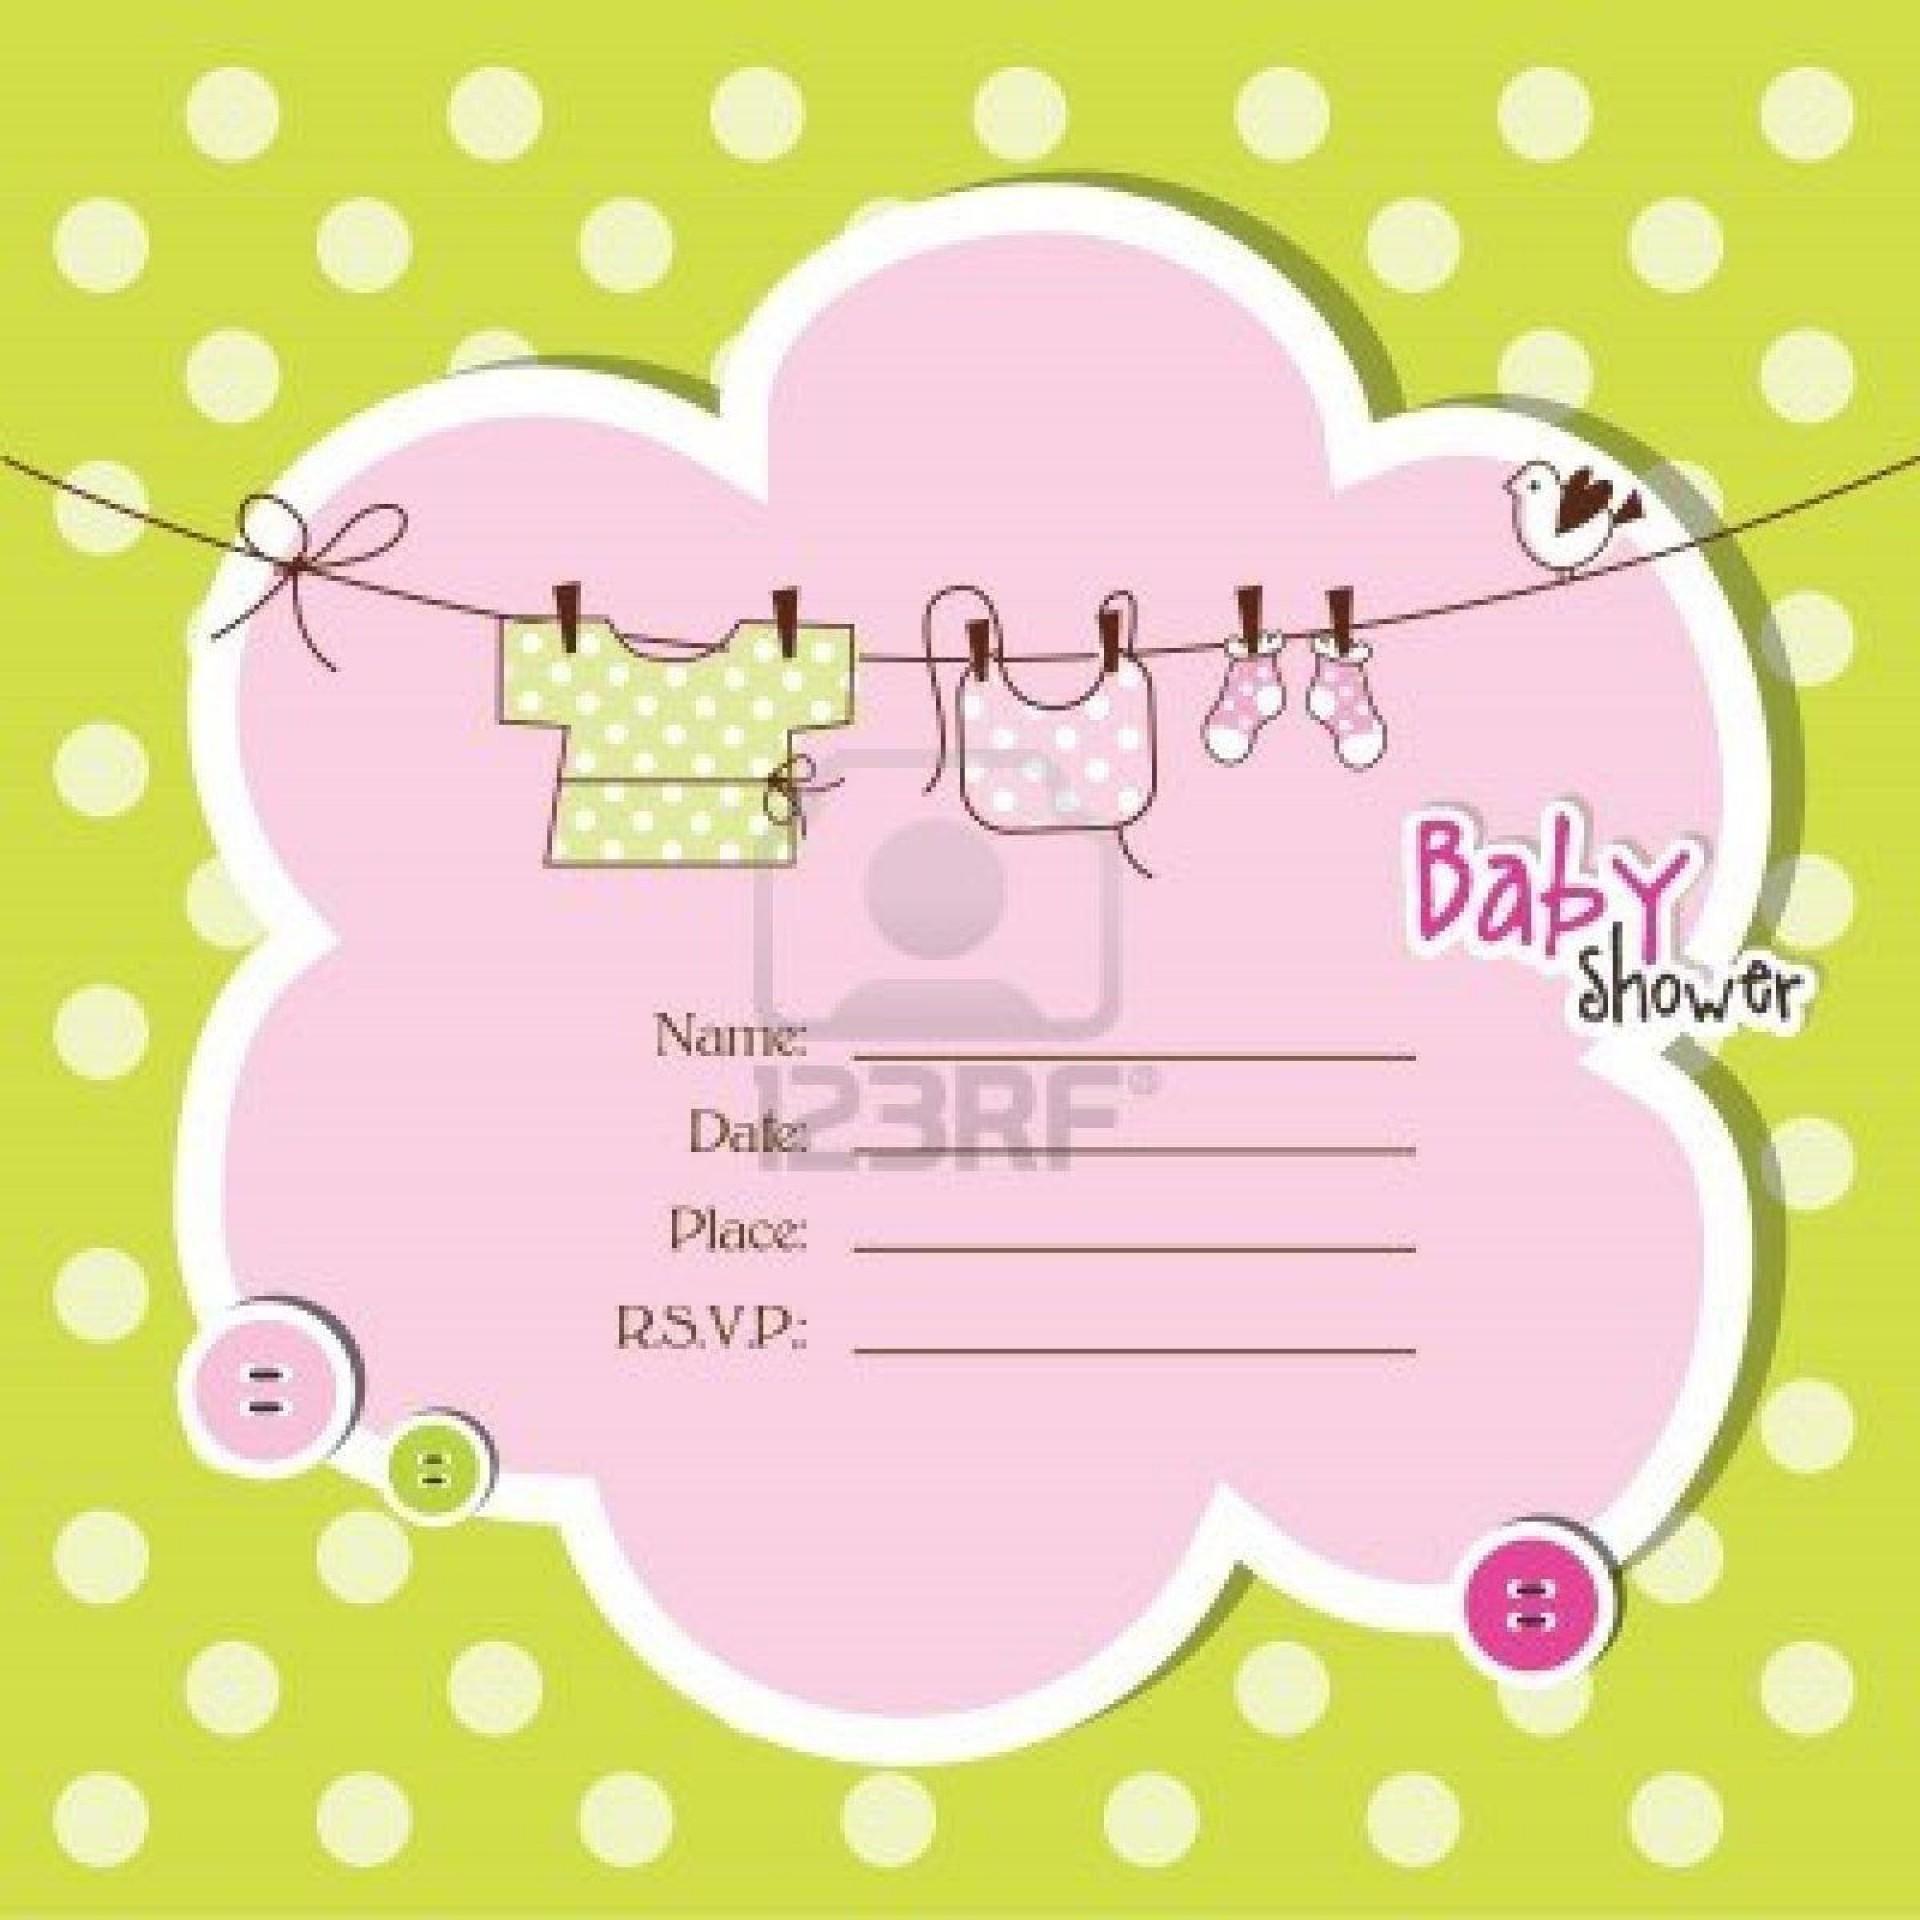 008 Shocking Microsoft Word Invitation Template Baby Shower Sample  Free Editable Invite1920